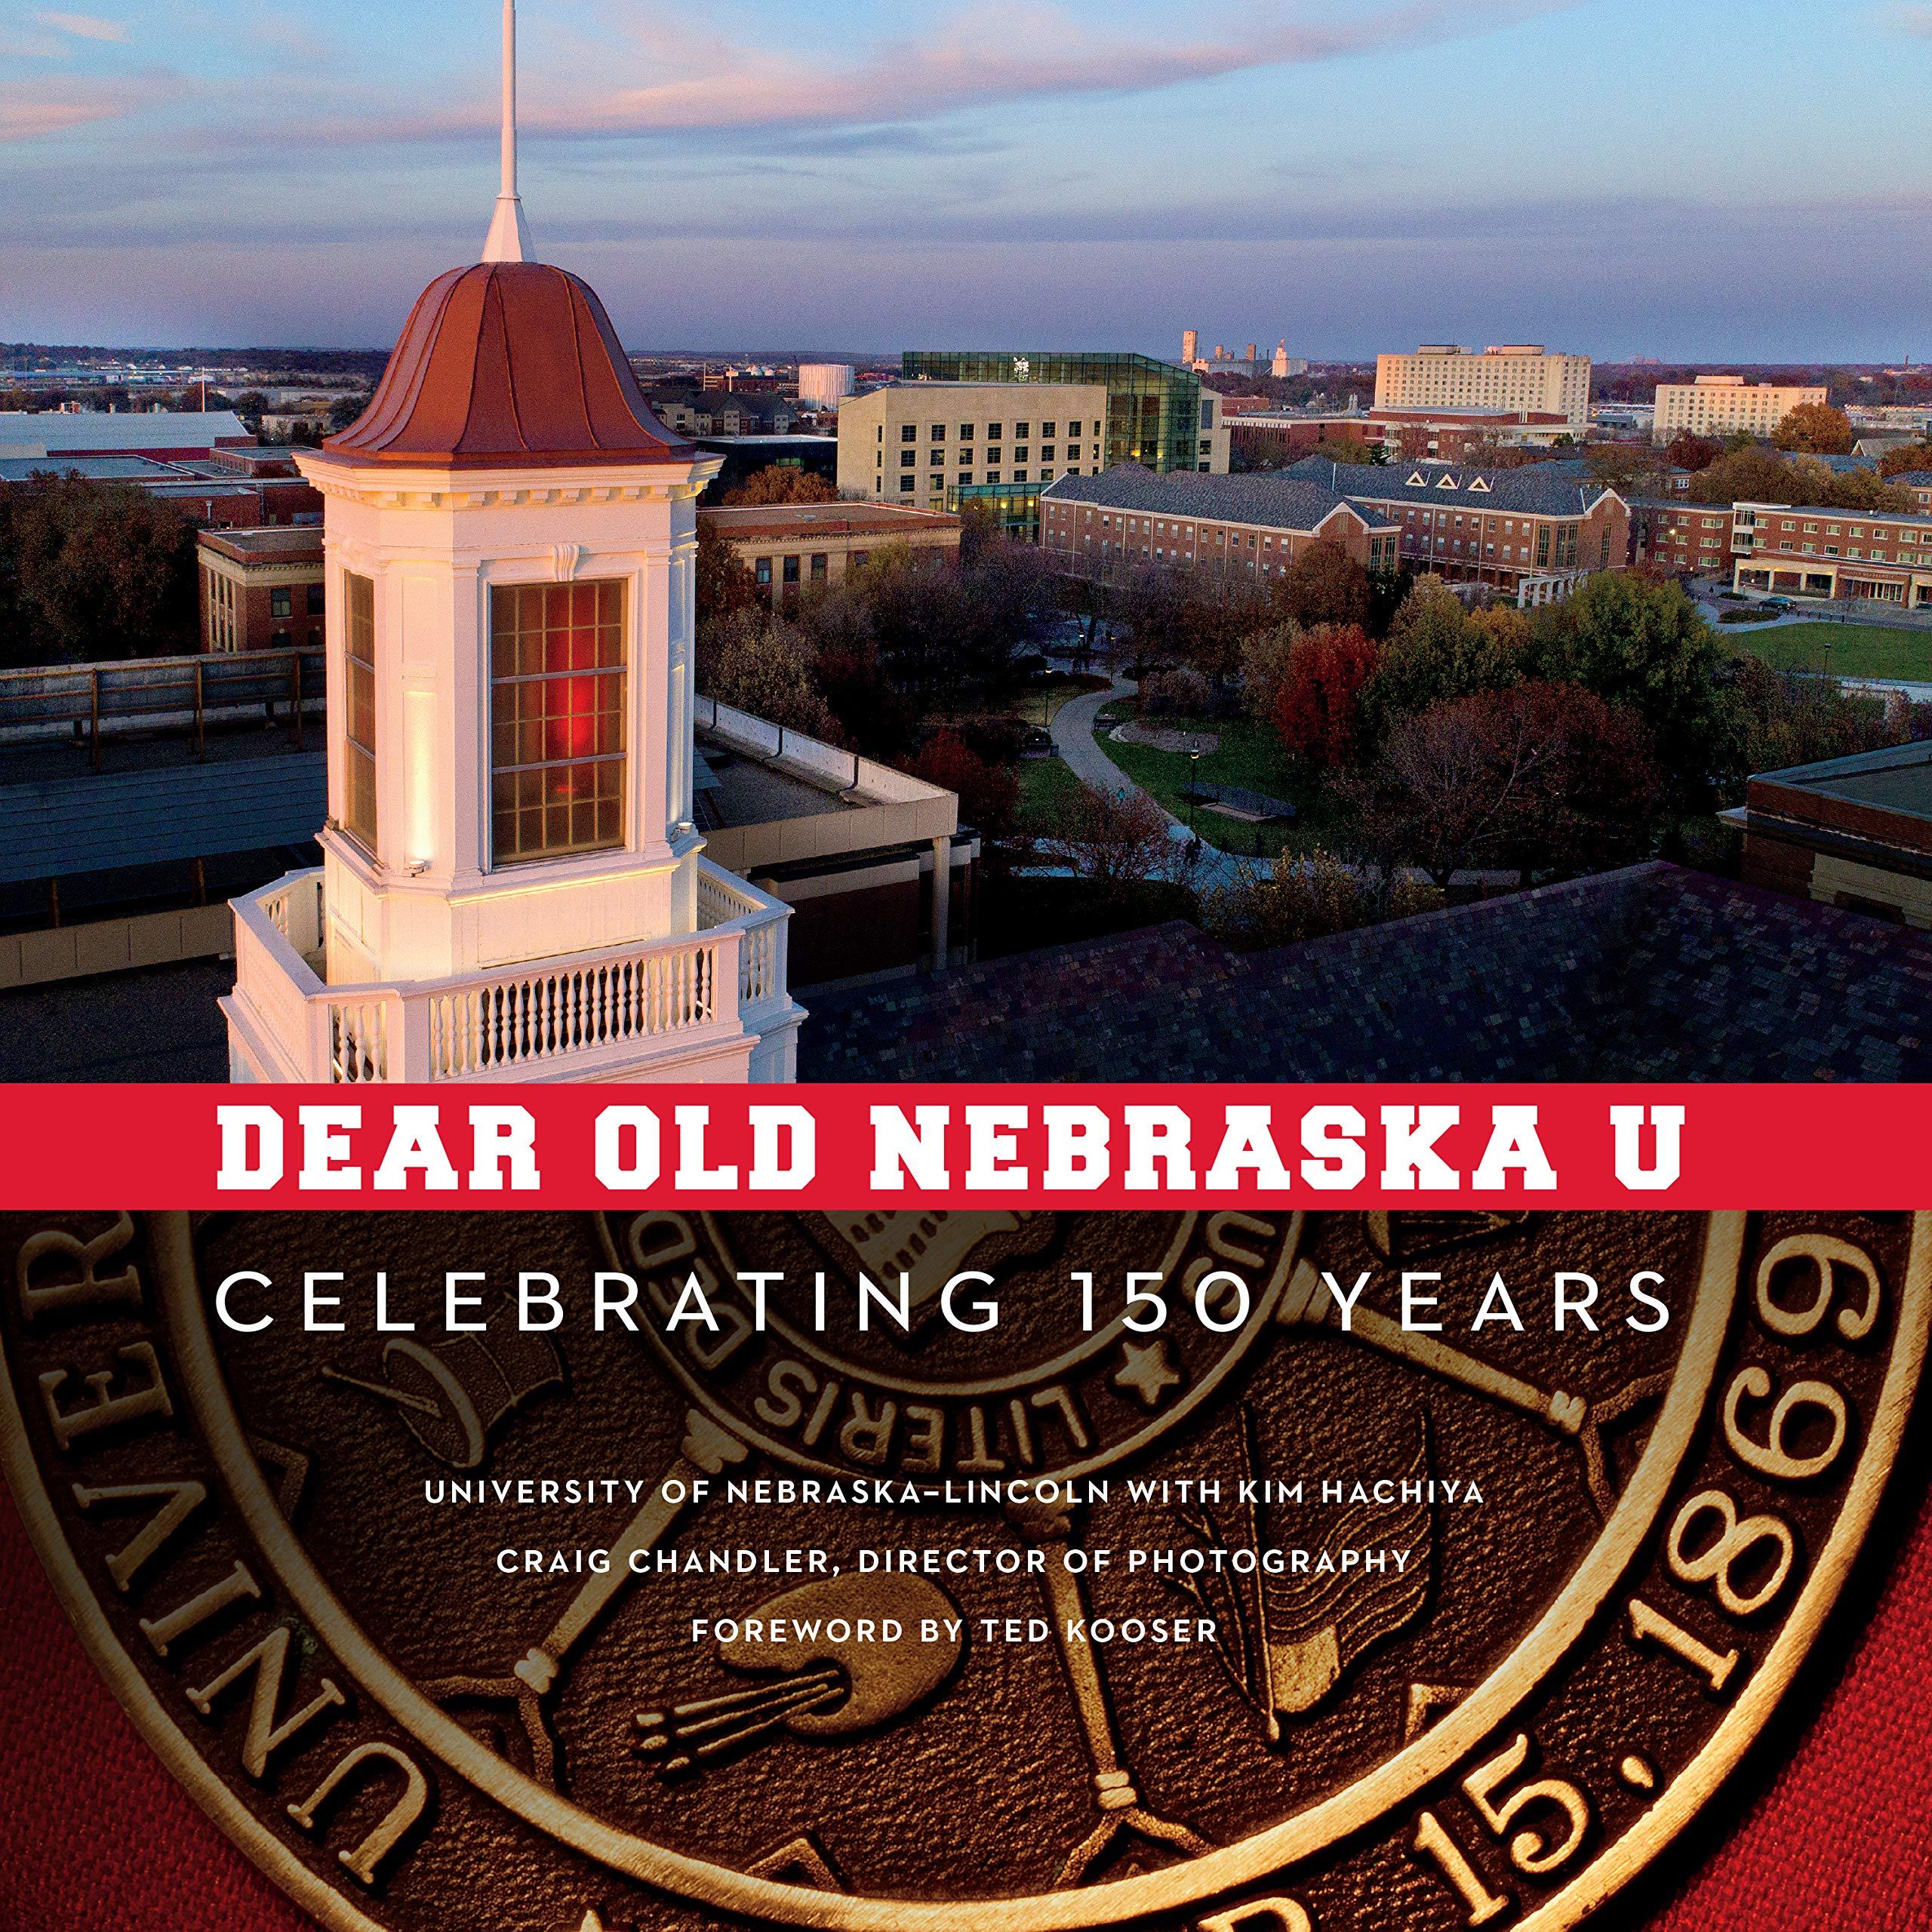 Dear Old Nebraska U book cover